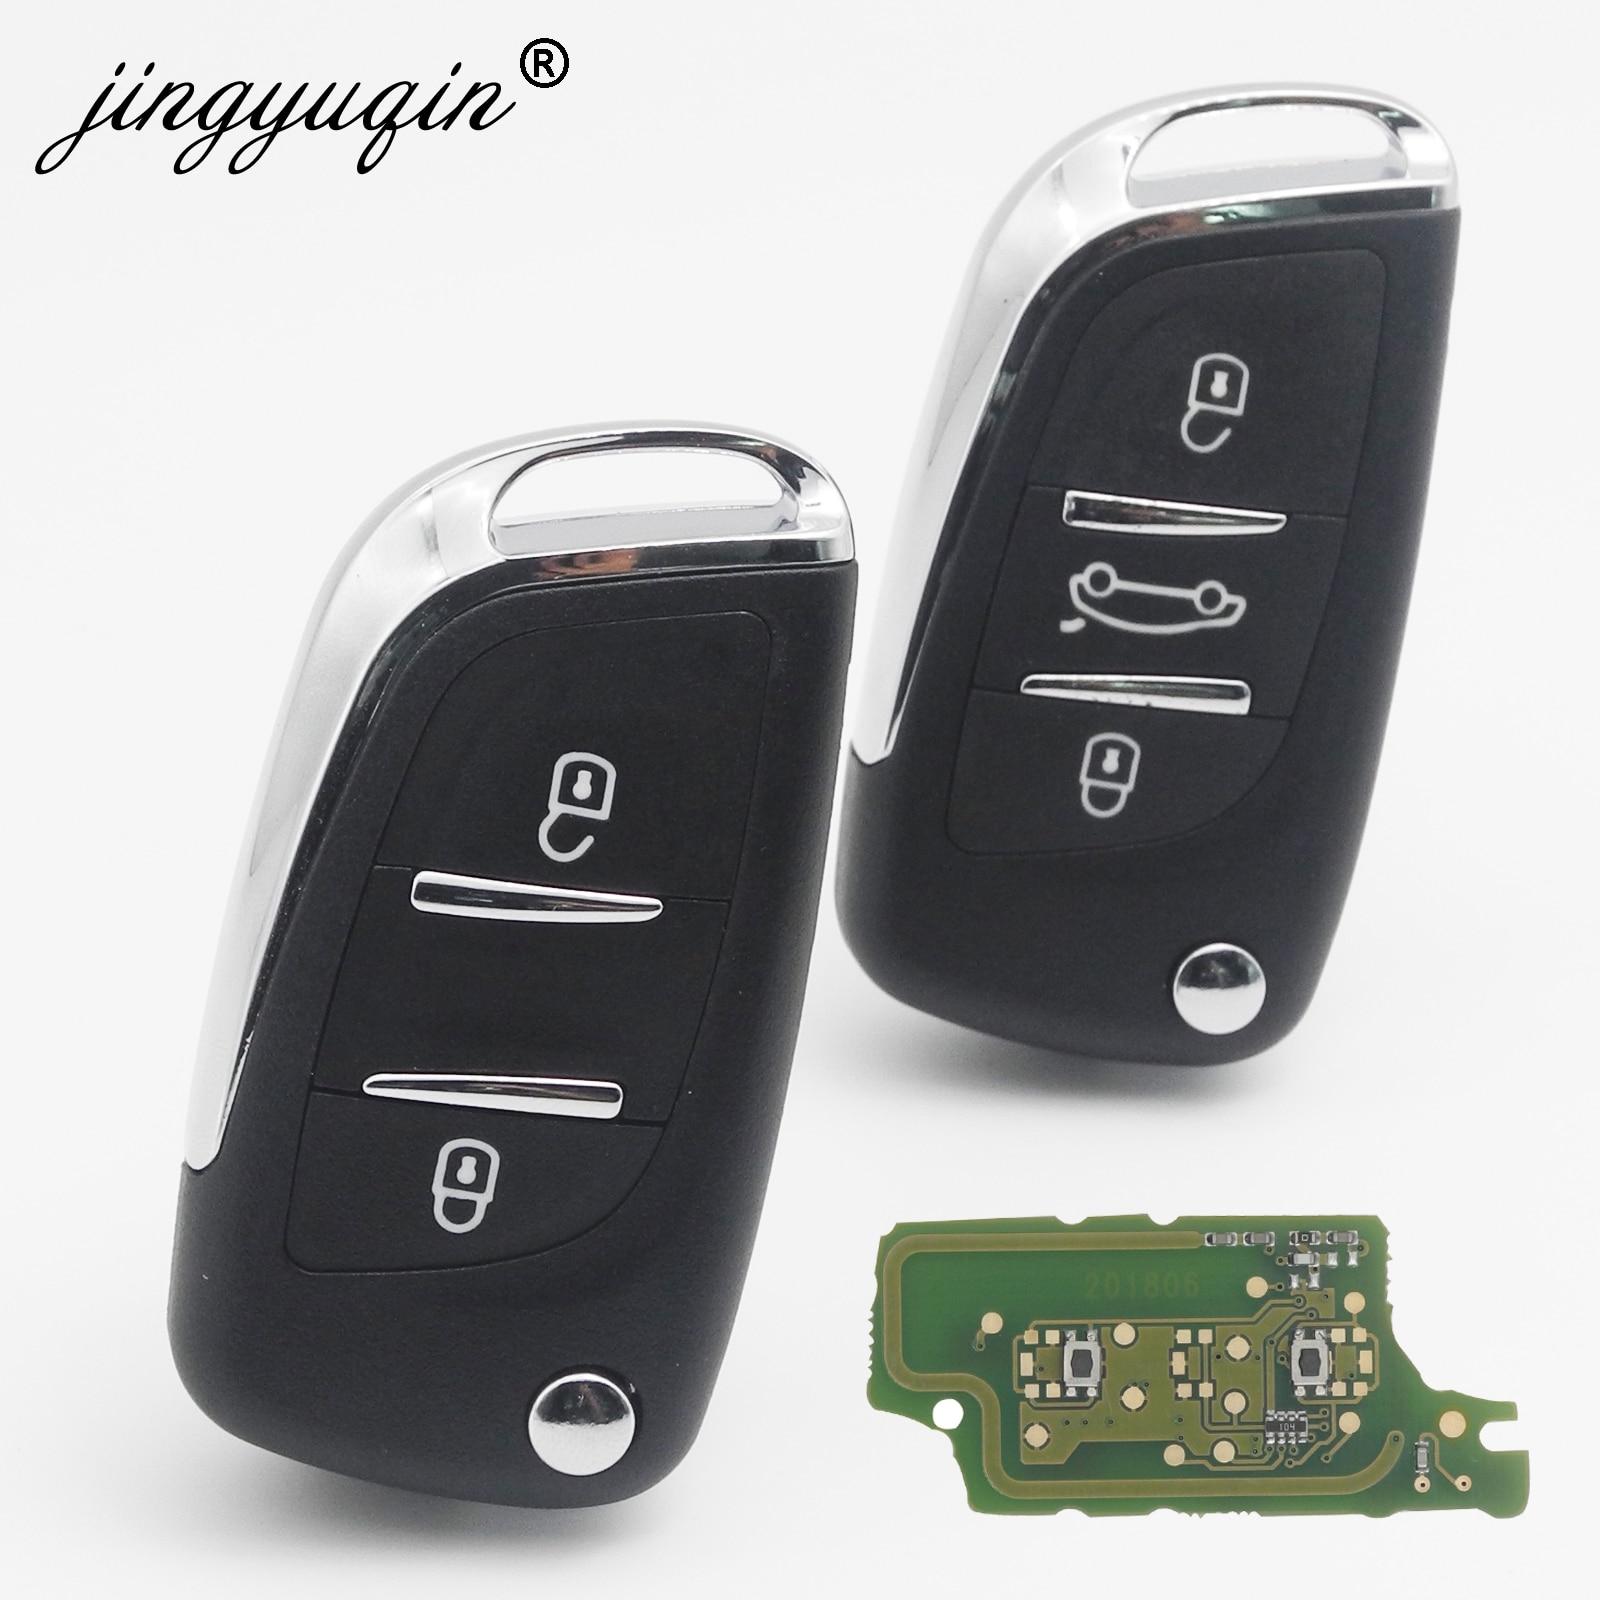 Jingyuqin 433MHz ASK/FSK Modified Flip Remote Car Key For Citroen PICASSO C2 C3 C4 C5 C6 C8 CE0536 VA2/HU83 PCF7961 2/3 BTN Key